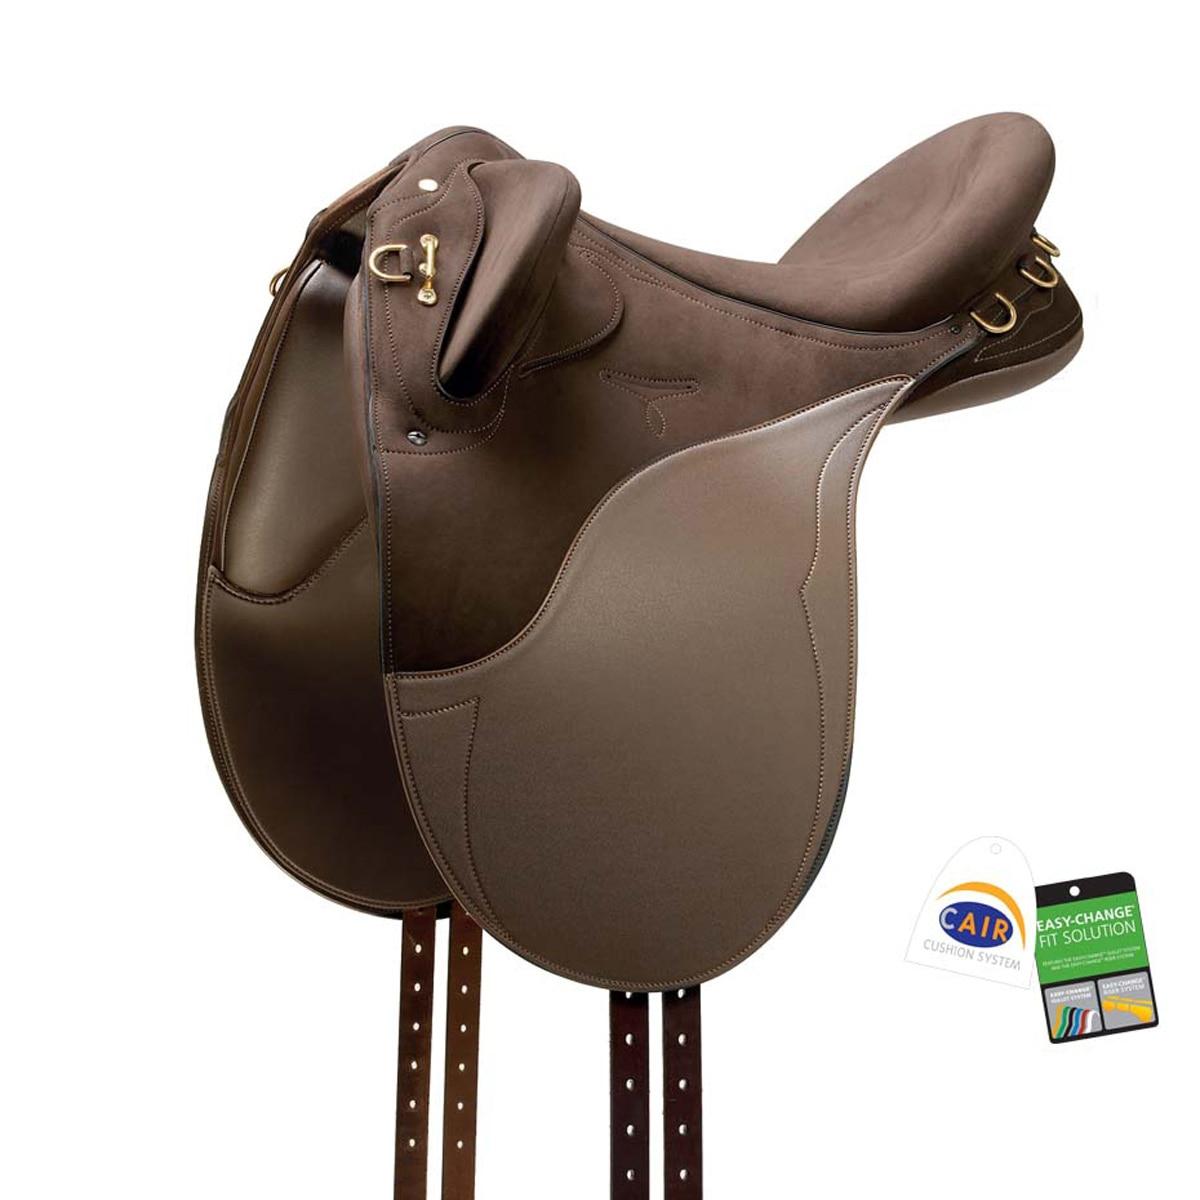 94a41427f50 Wintec Pro Stock Saddle